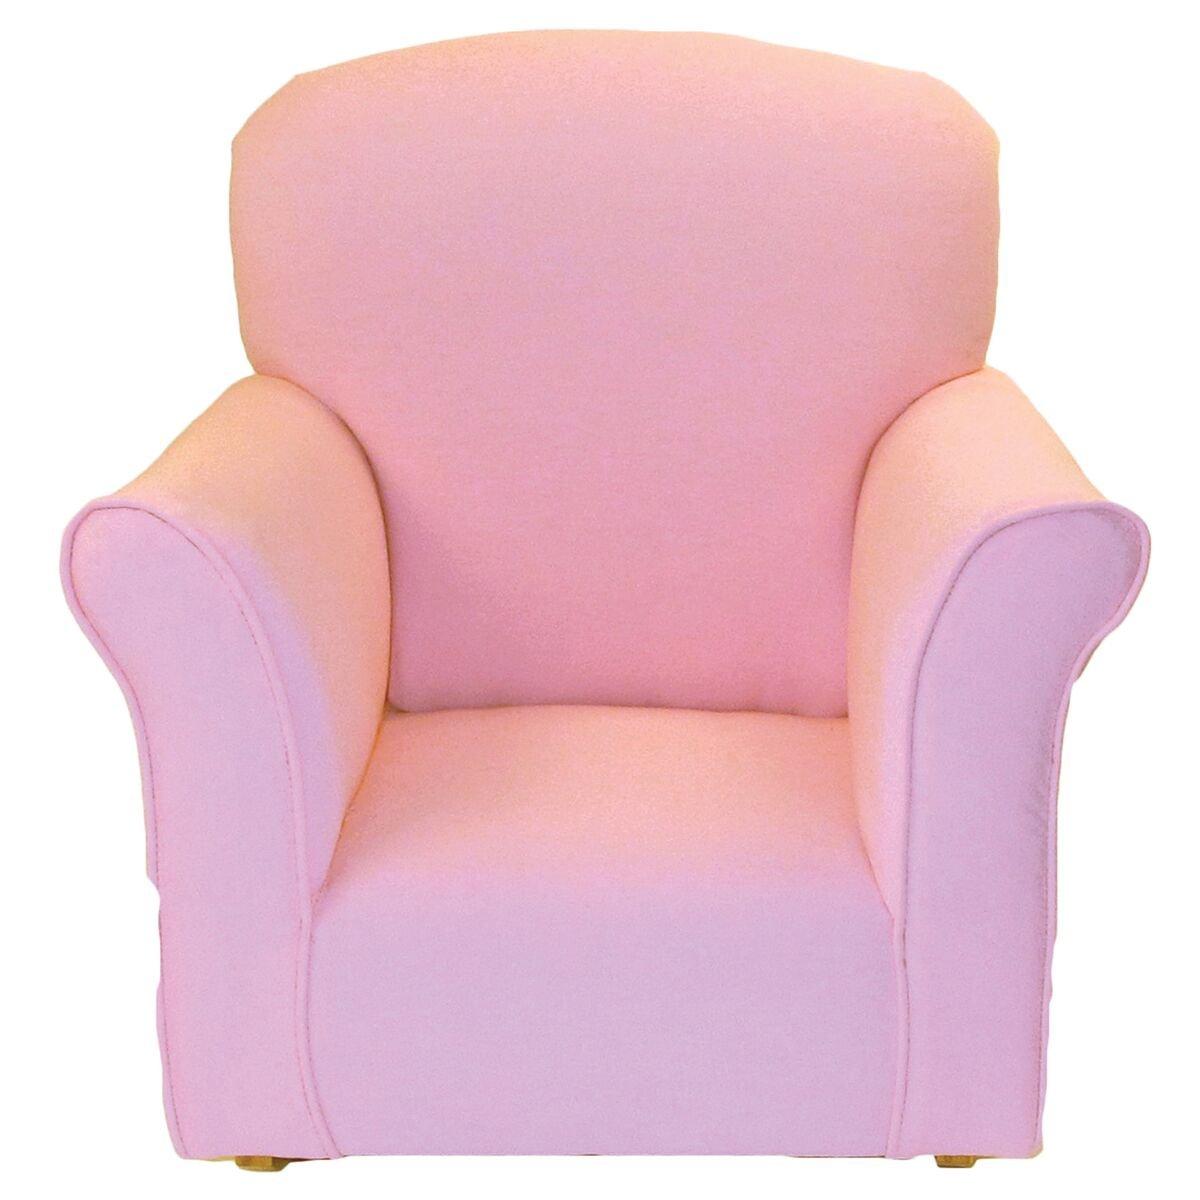 Brighton Home Furniture Toddler Rocker in Baby Pink Cotton